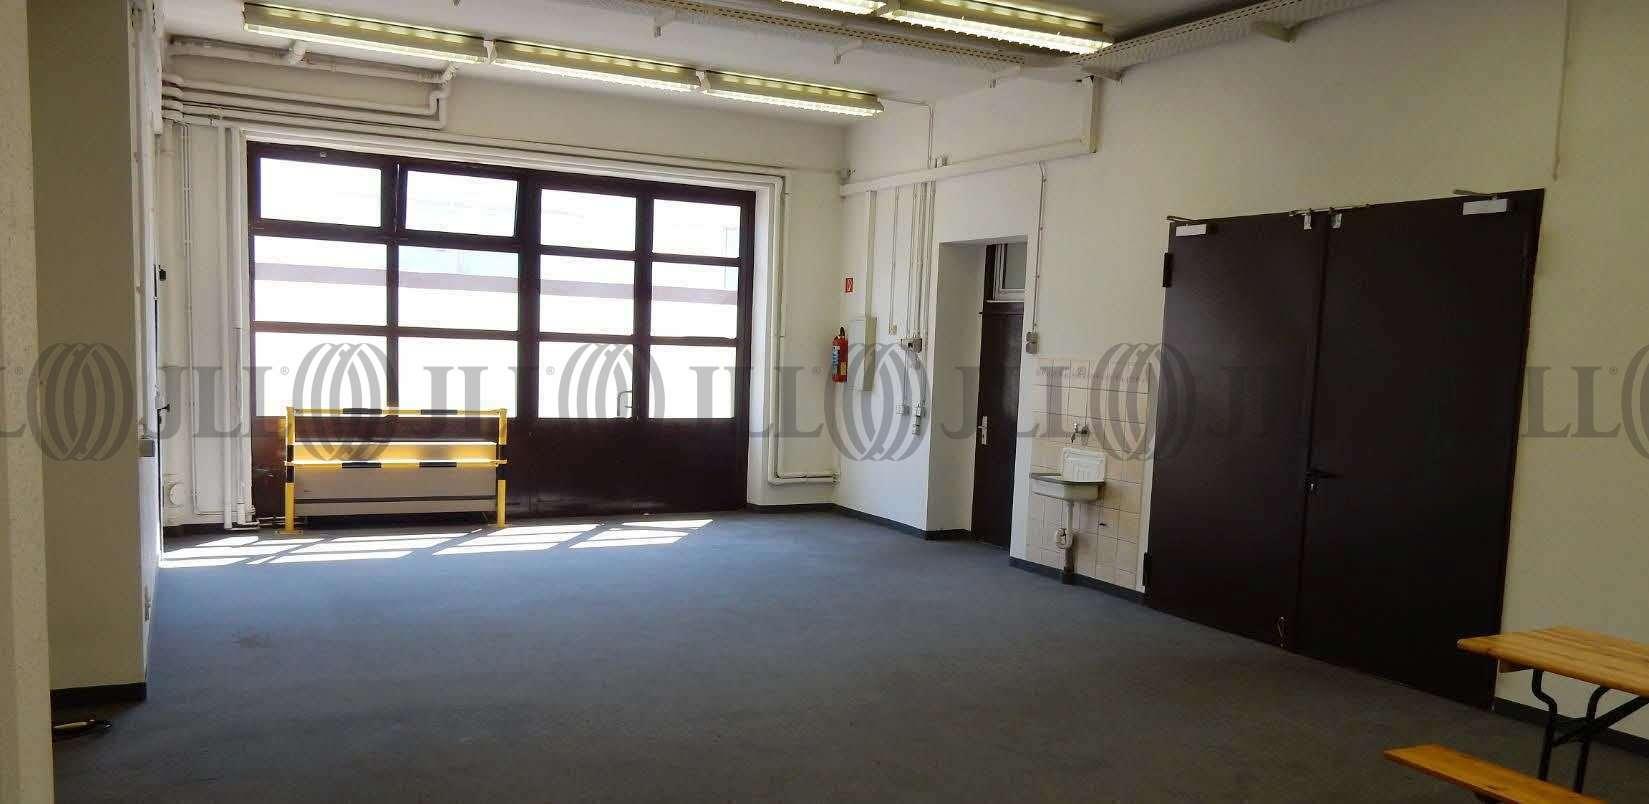 Büros Frankfurt am main, 60599 - Büro - Frankfurt am Main, Sachsenhausen - F2486 - 9732712